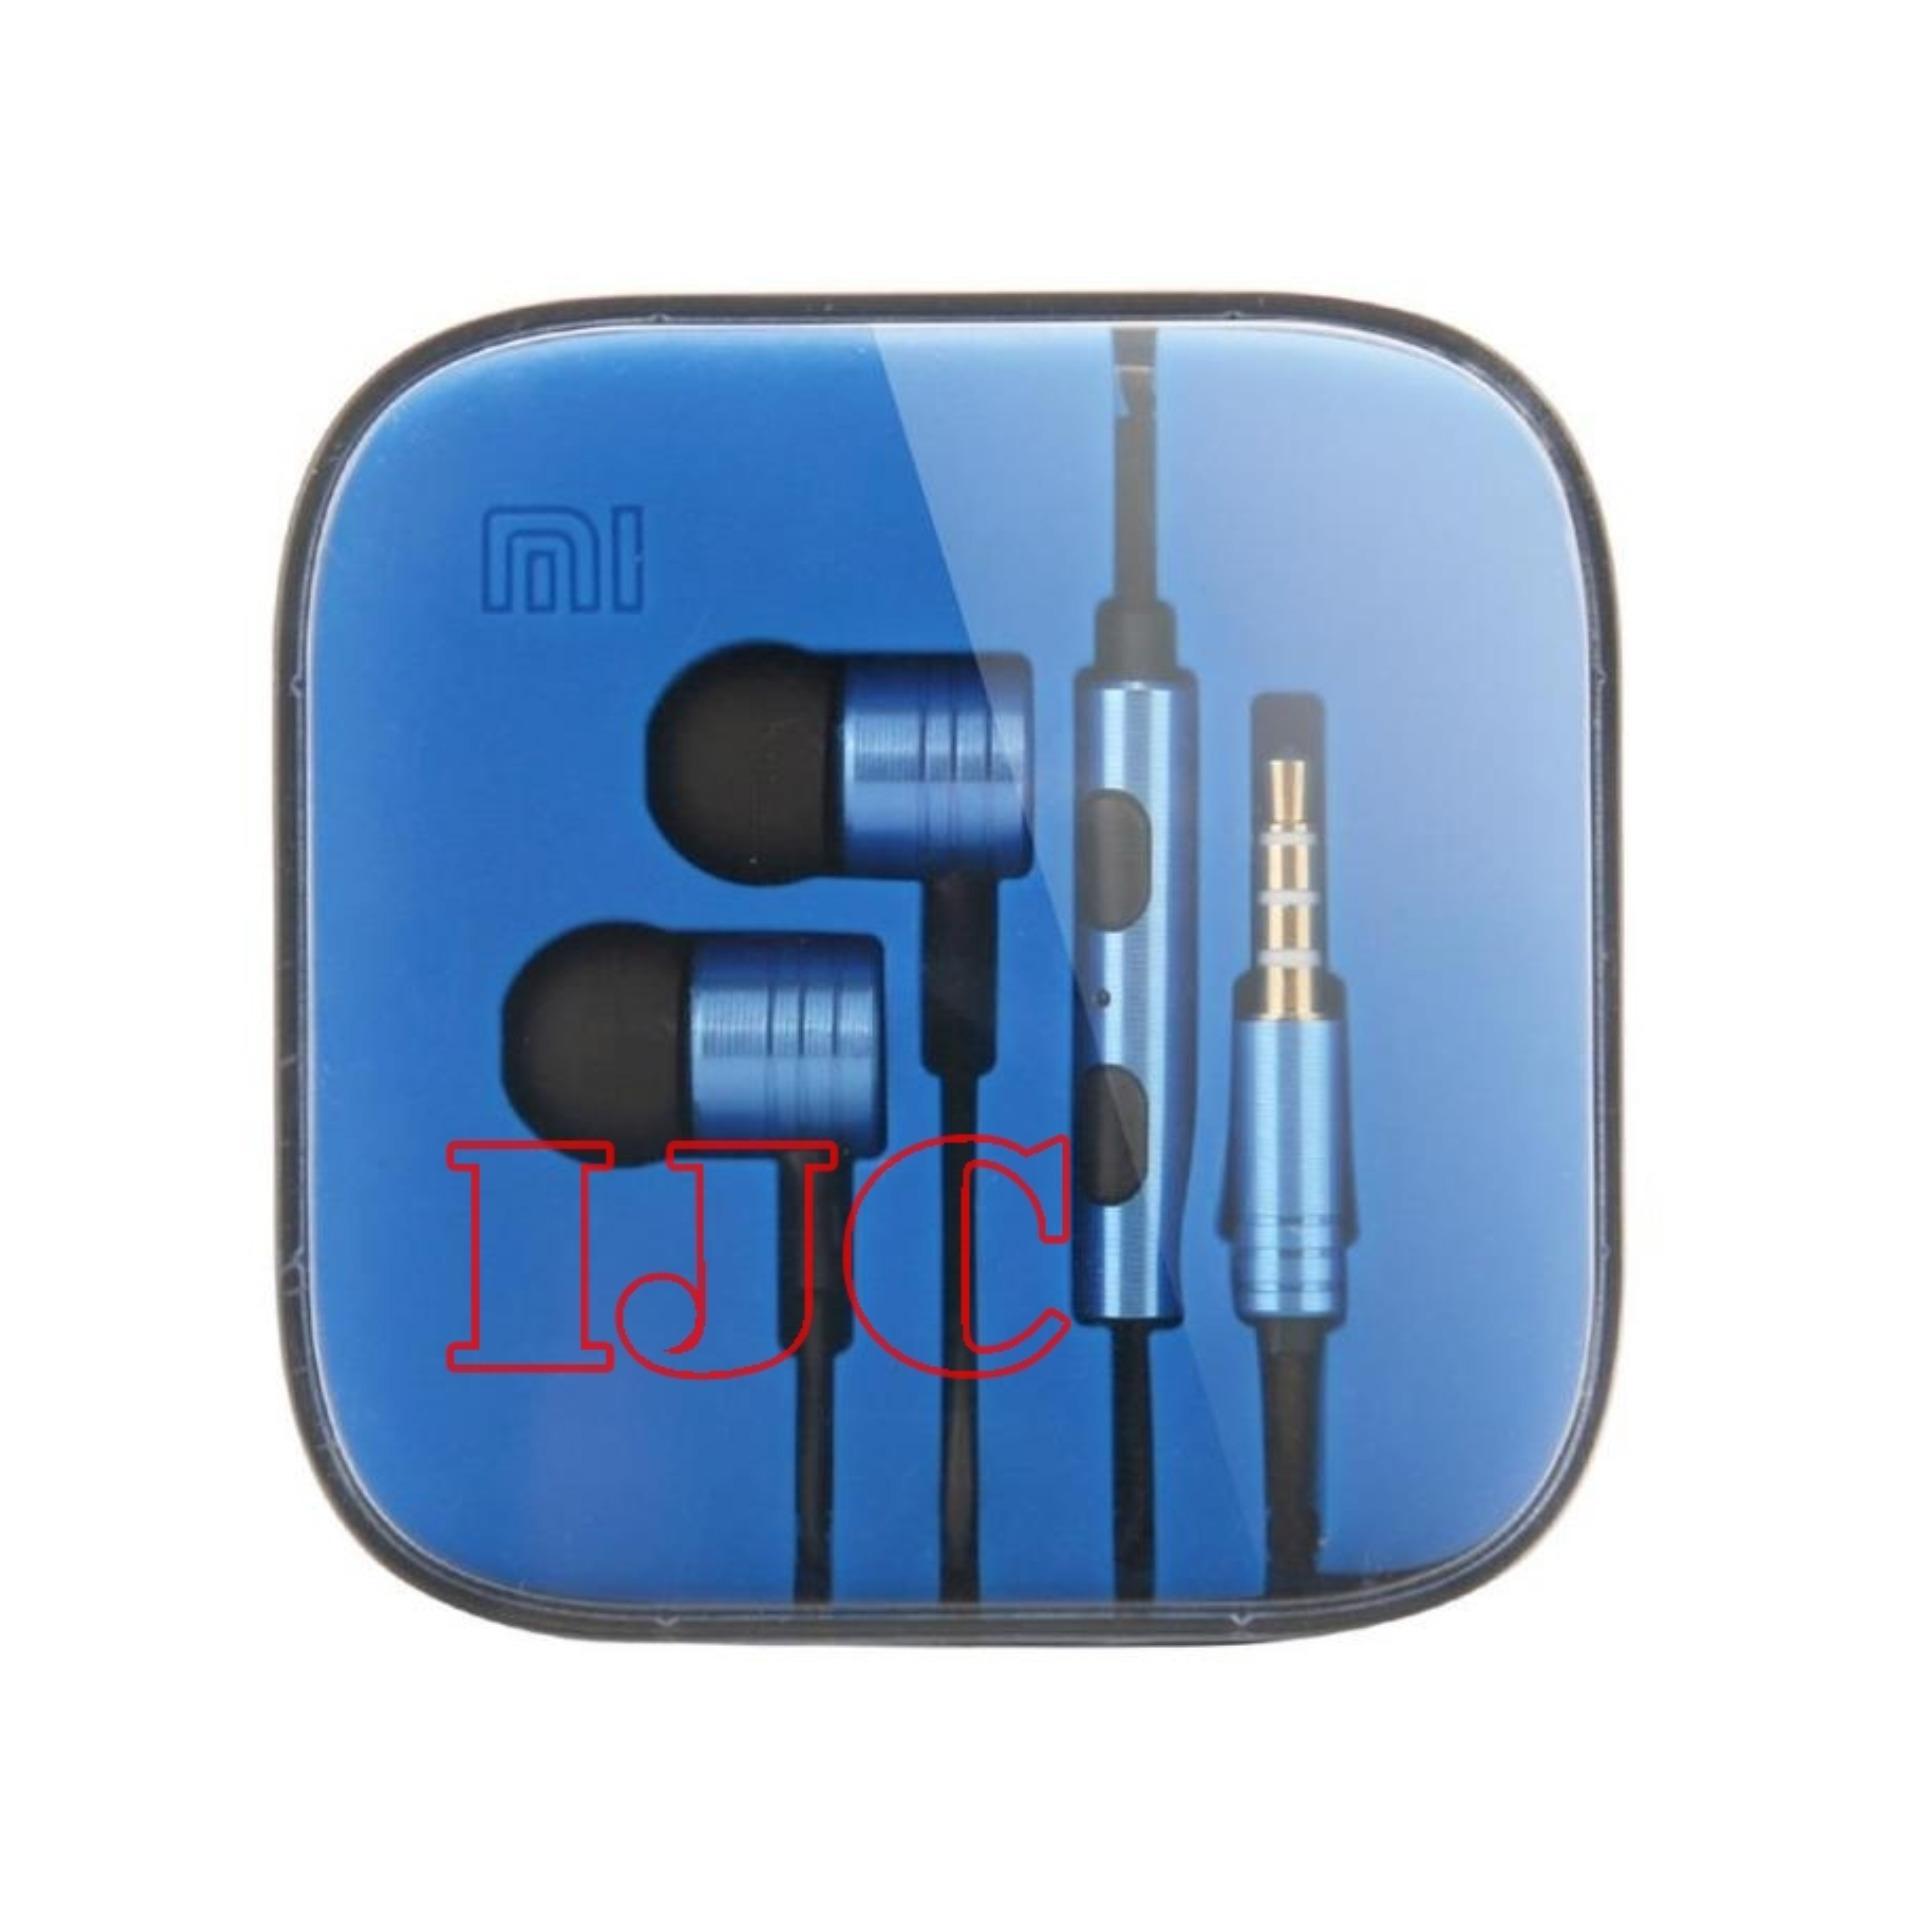 ... Xiaomi Earphone Big Bass Piston Mi 2nd Generation Handsfree/Headset BLUE ...